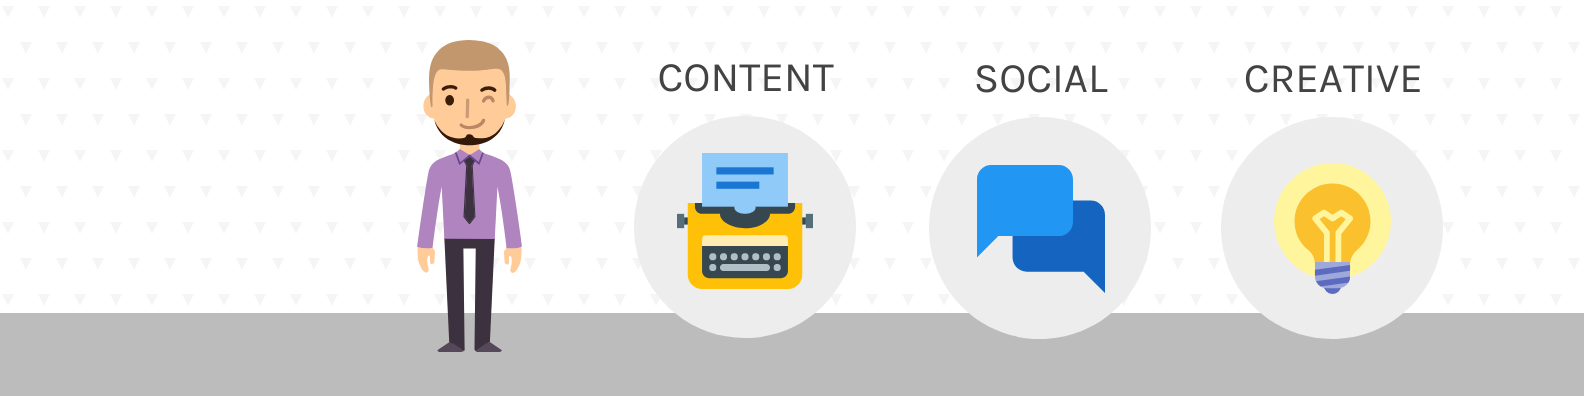 Marketer Profile LinkedIn Banner Template